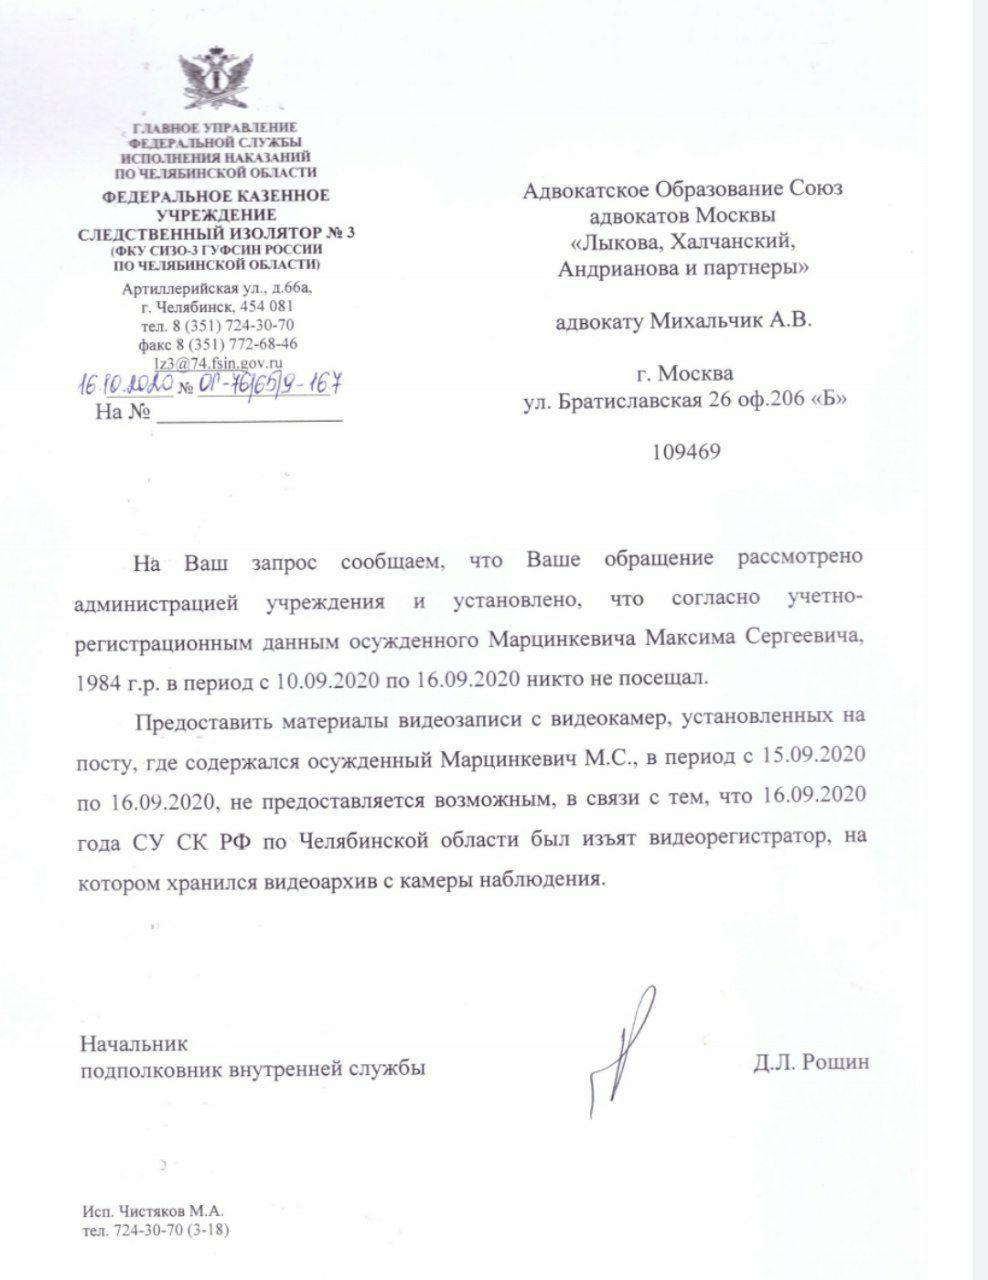 Ответ Дениса Рощина по поводу убийства Тесака (Марцинкевича)